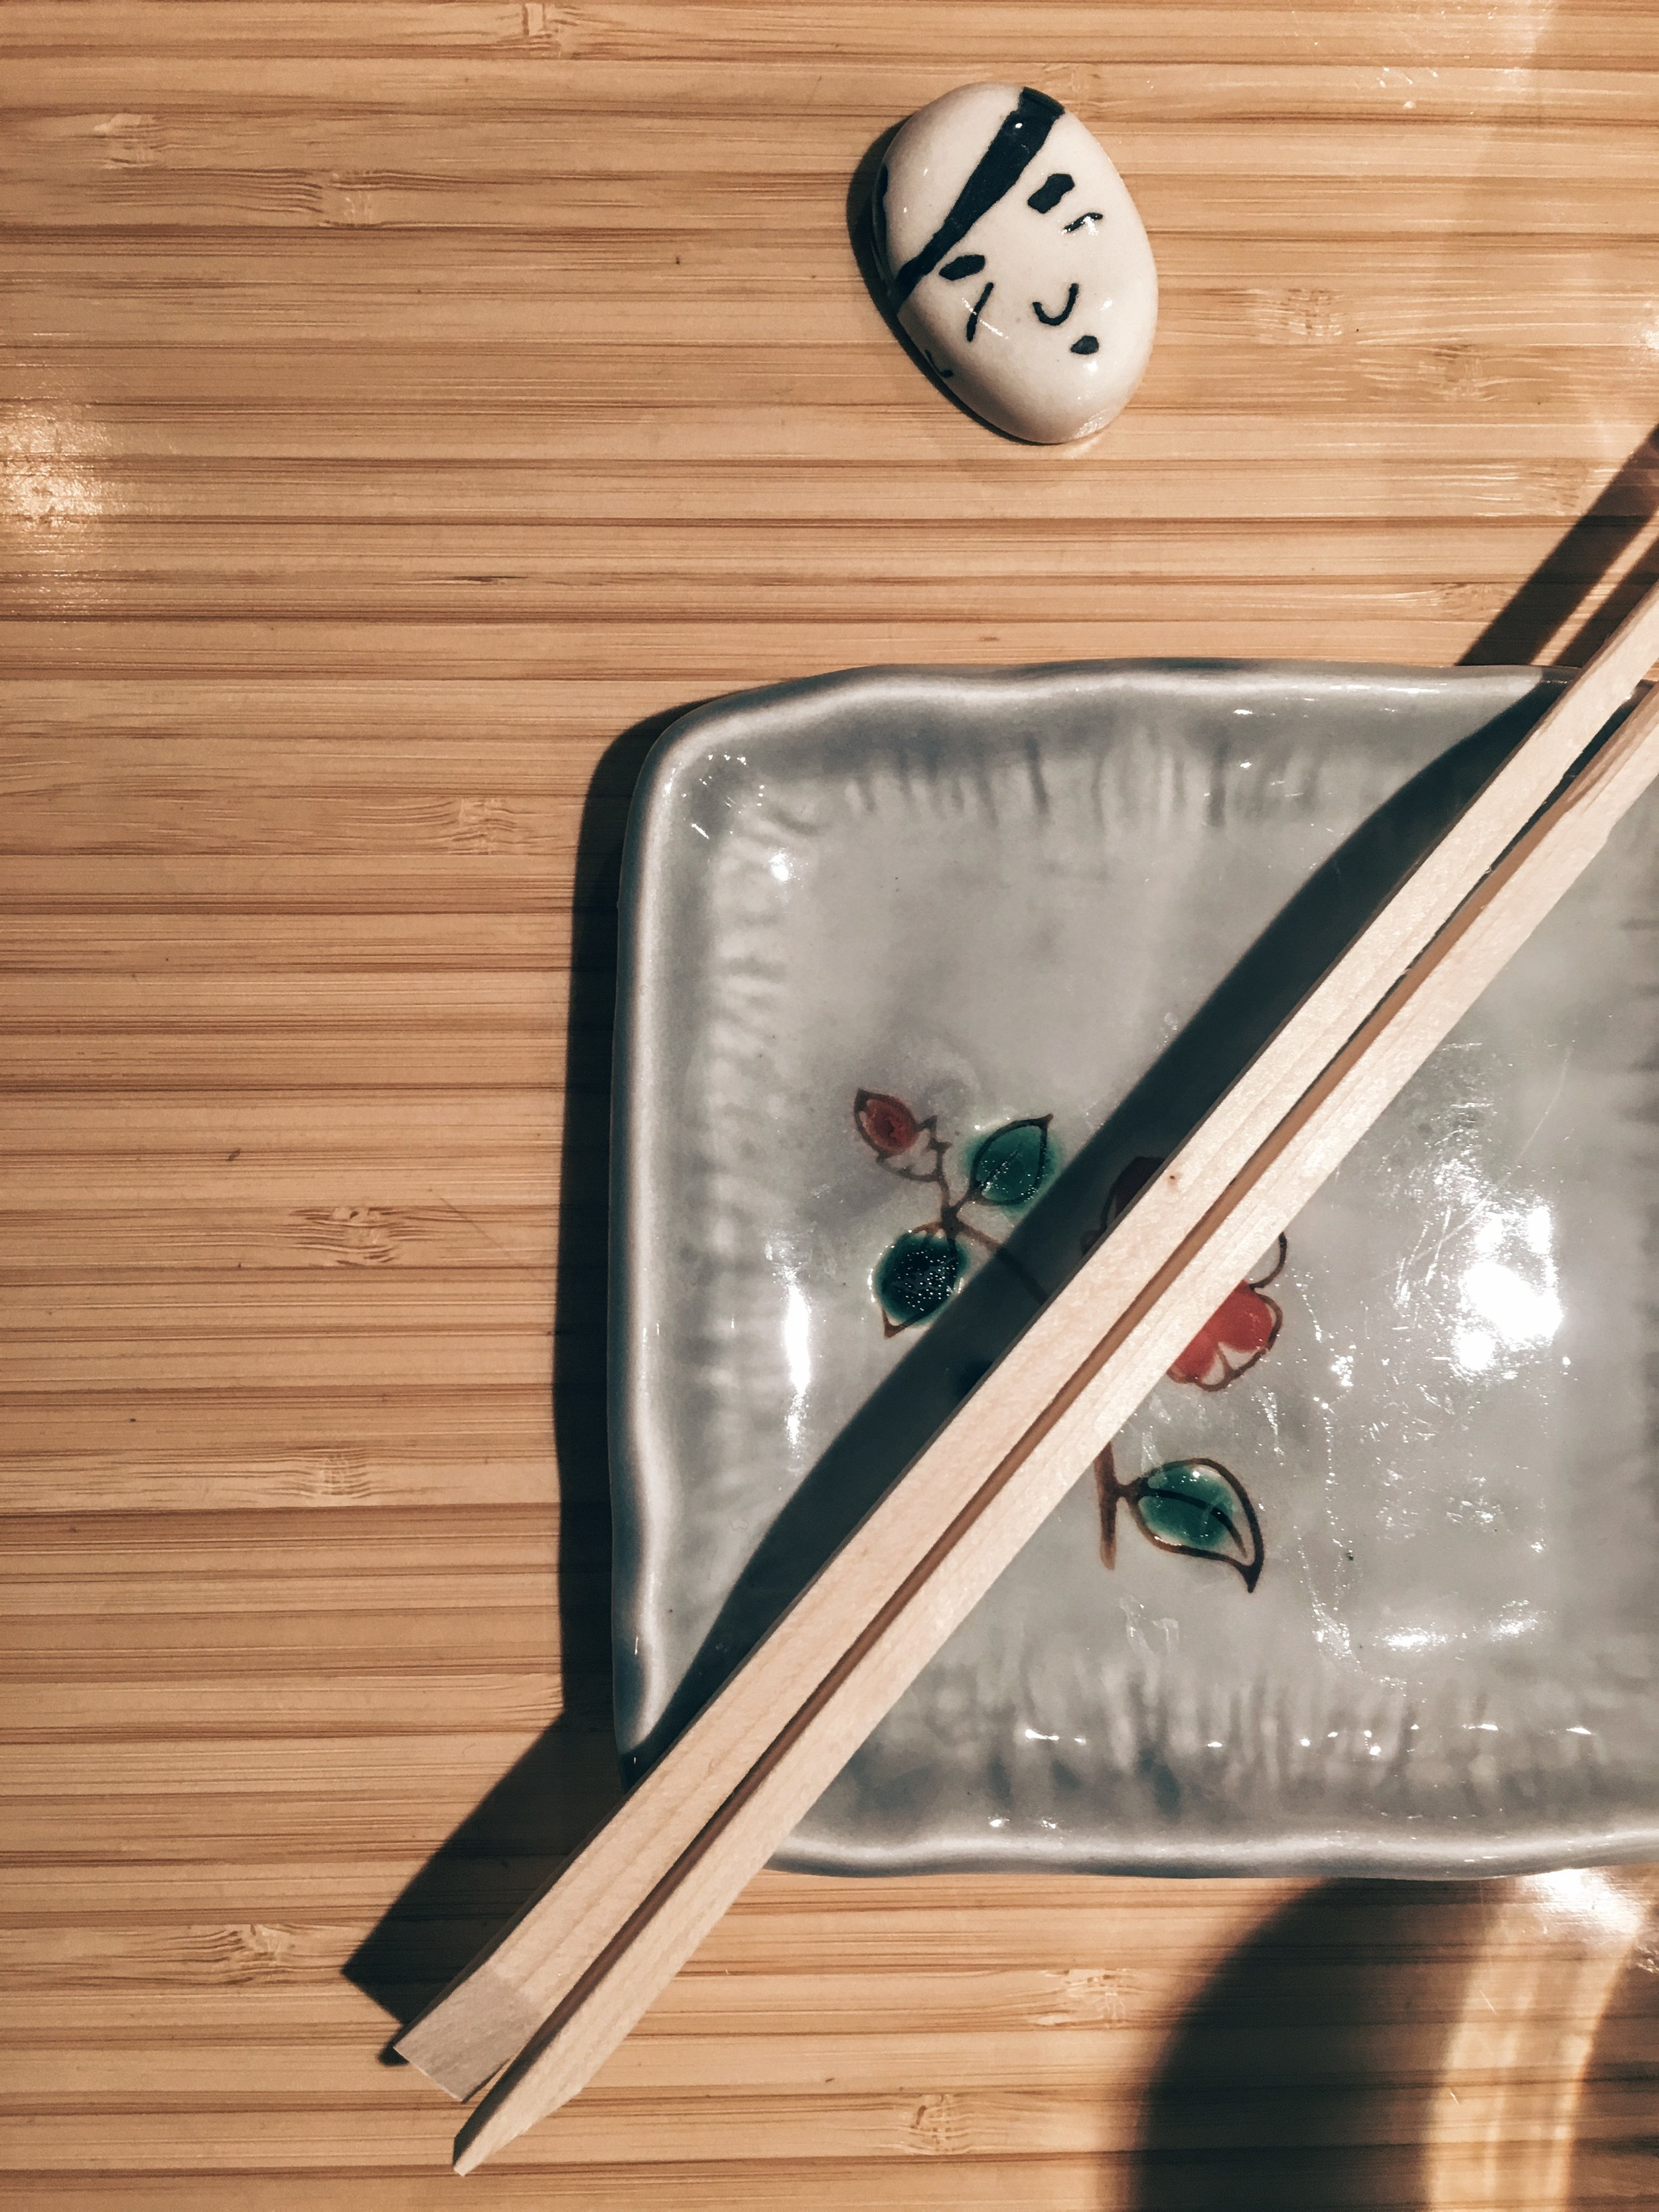 Chopsticks ready for Omakase at Michelin-star awarded sushi joint, Sushi of Gari